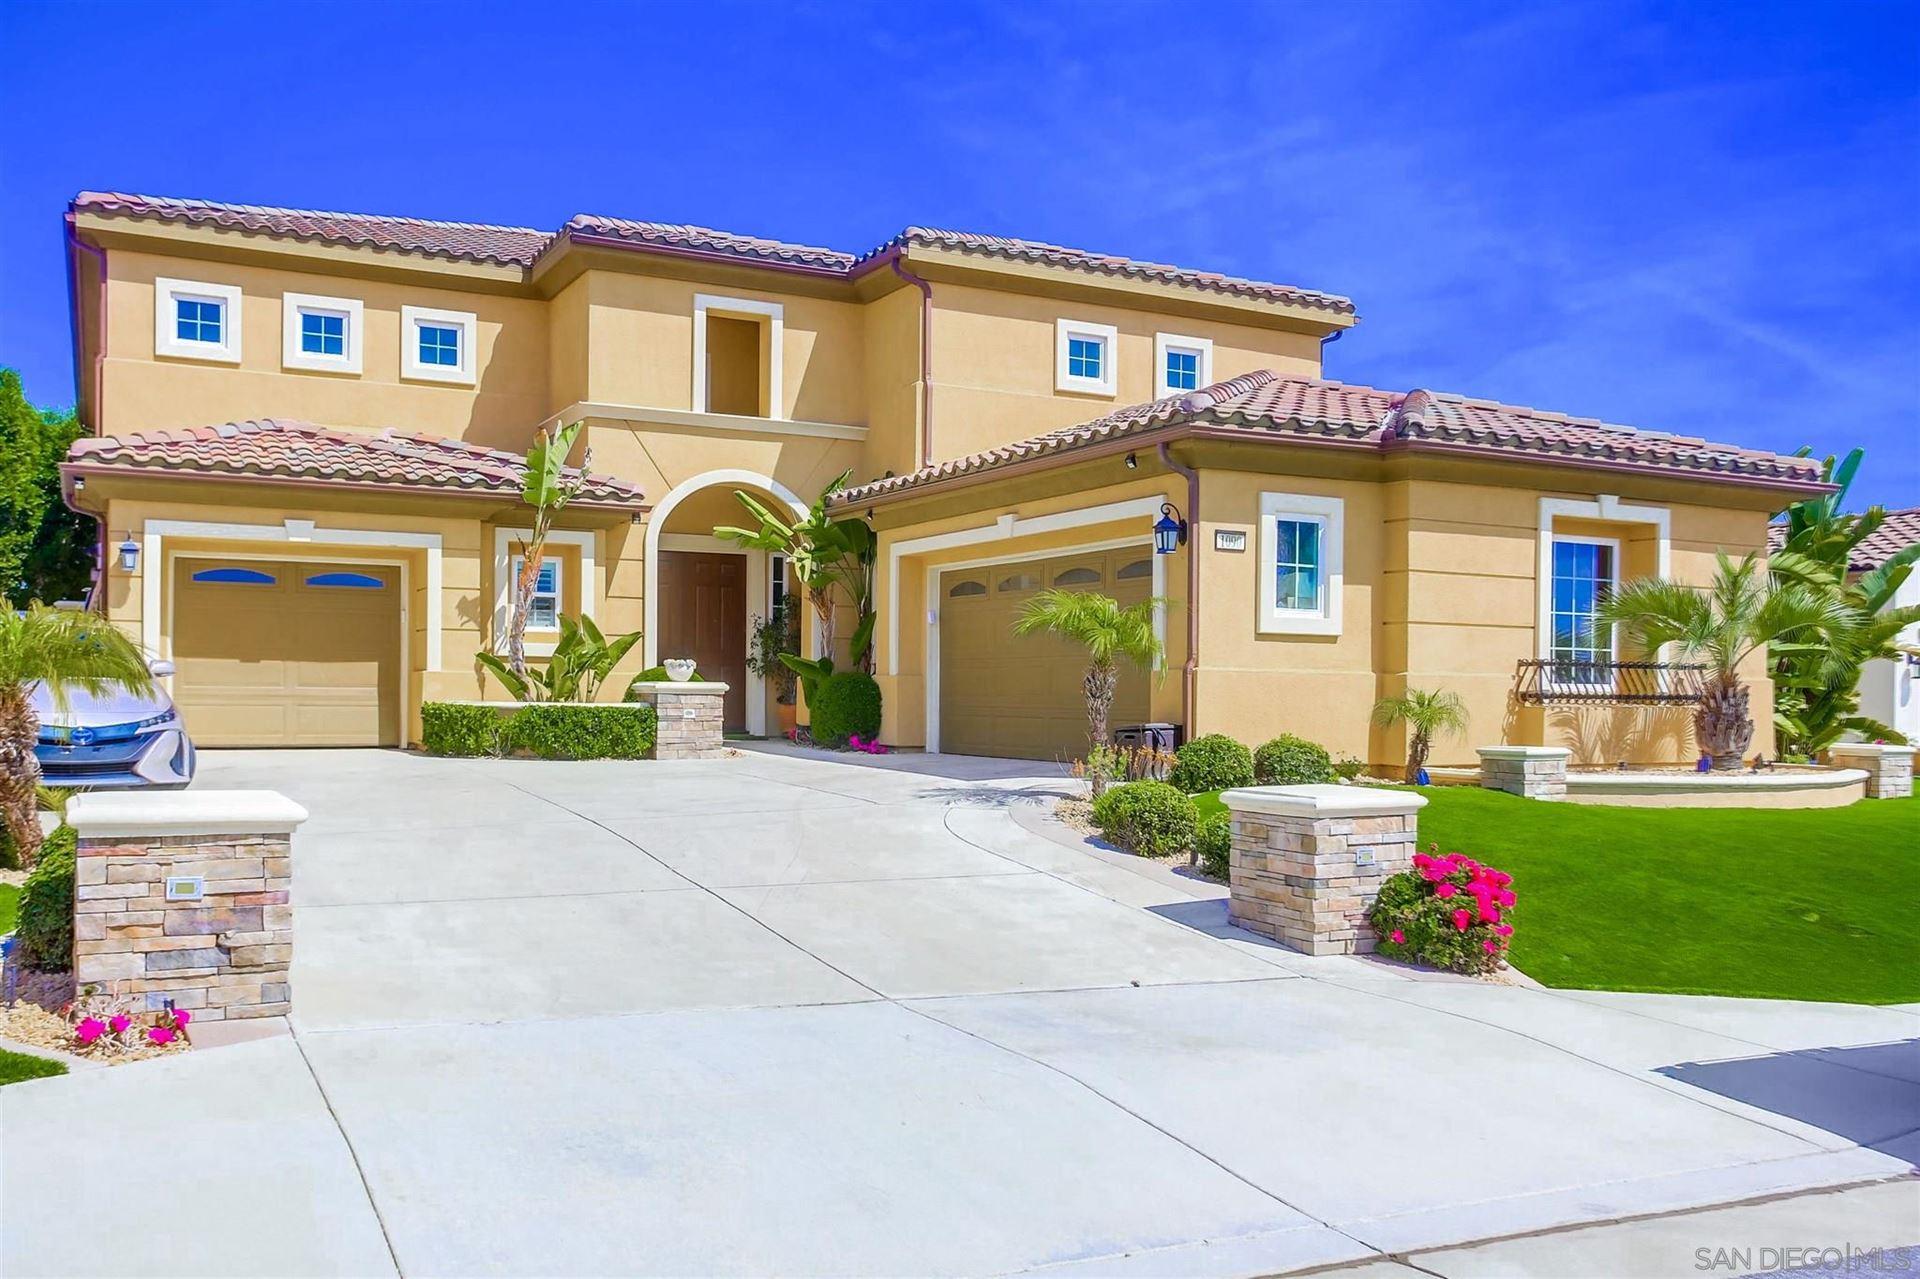 Photo of 1090 Village Dr, Oceanside, CA 92057 (MLS # 210008552)